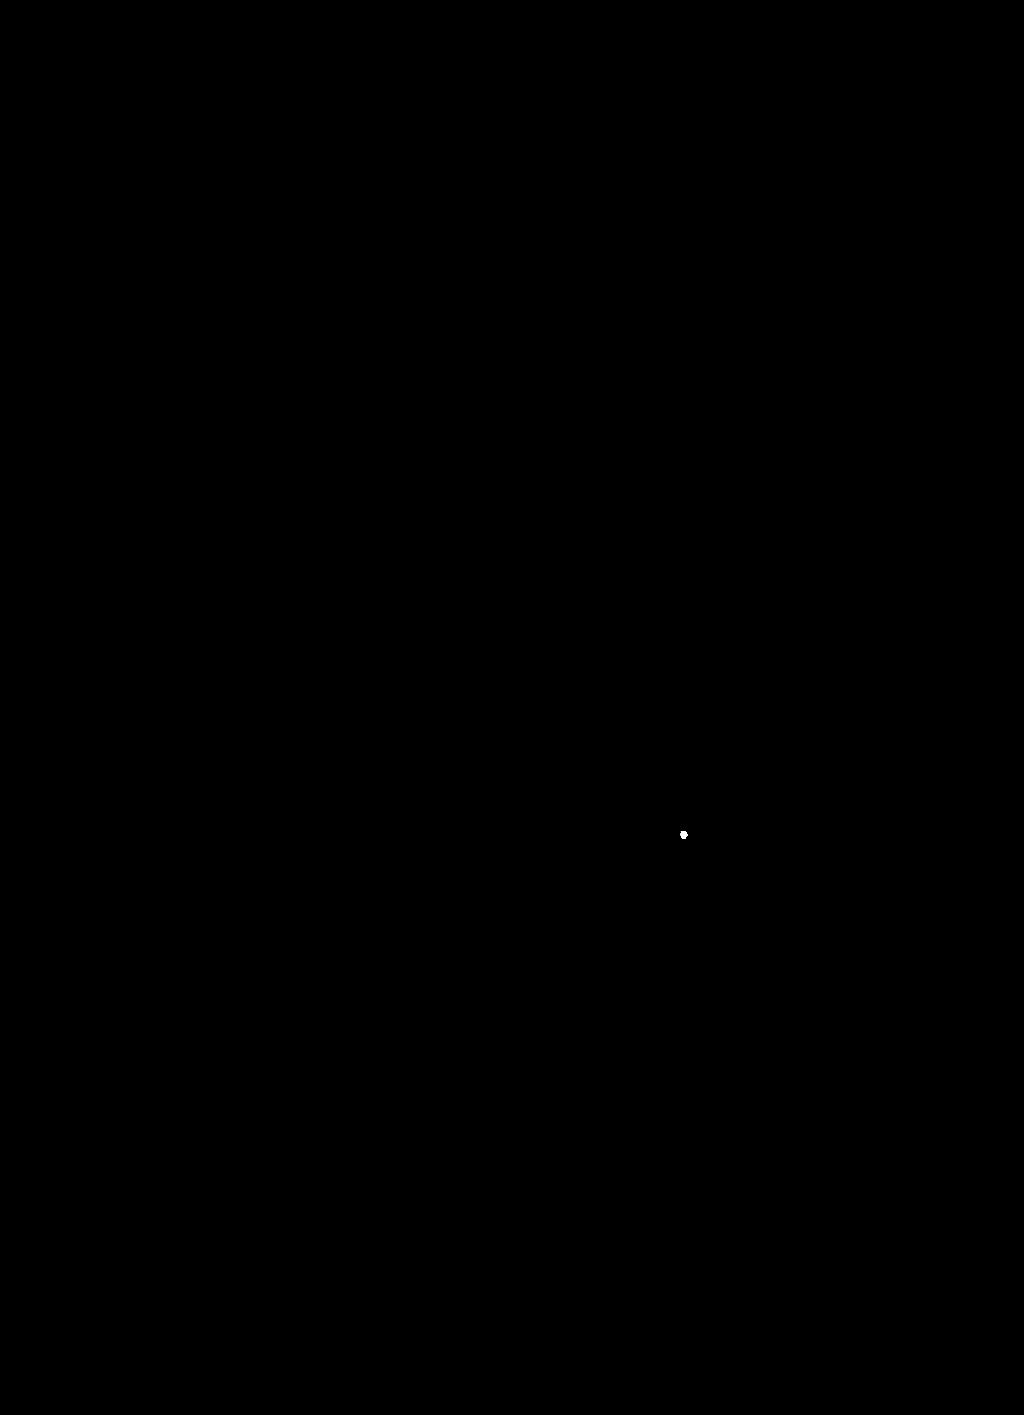 nisekoi ch069 chitoge chibi lineartosama00 on deviantart